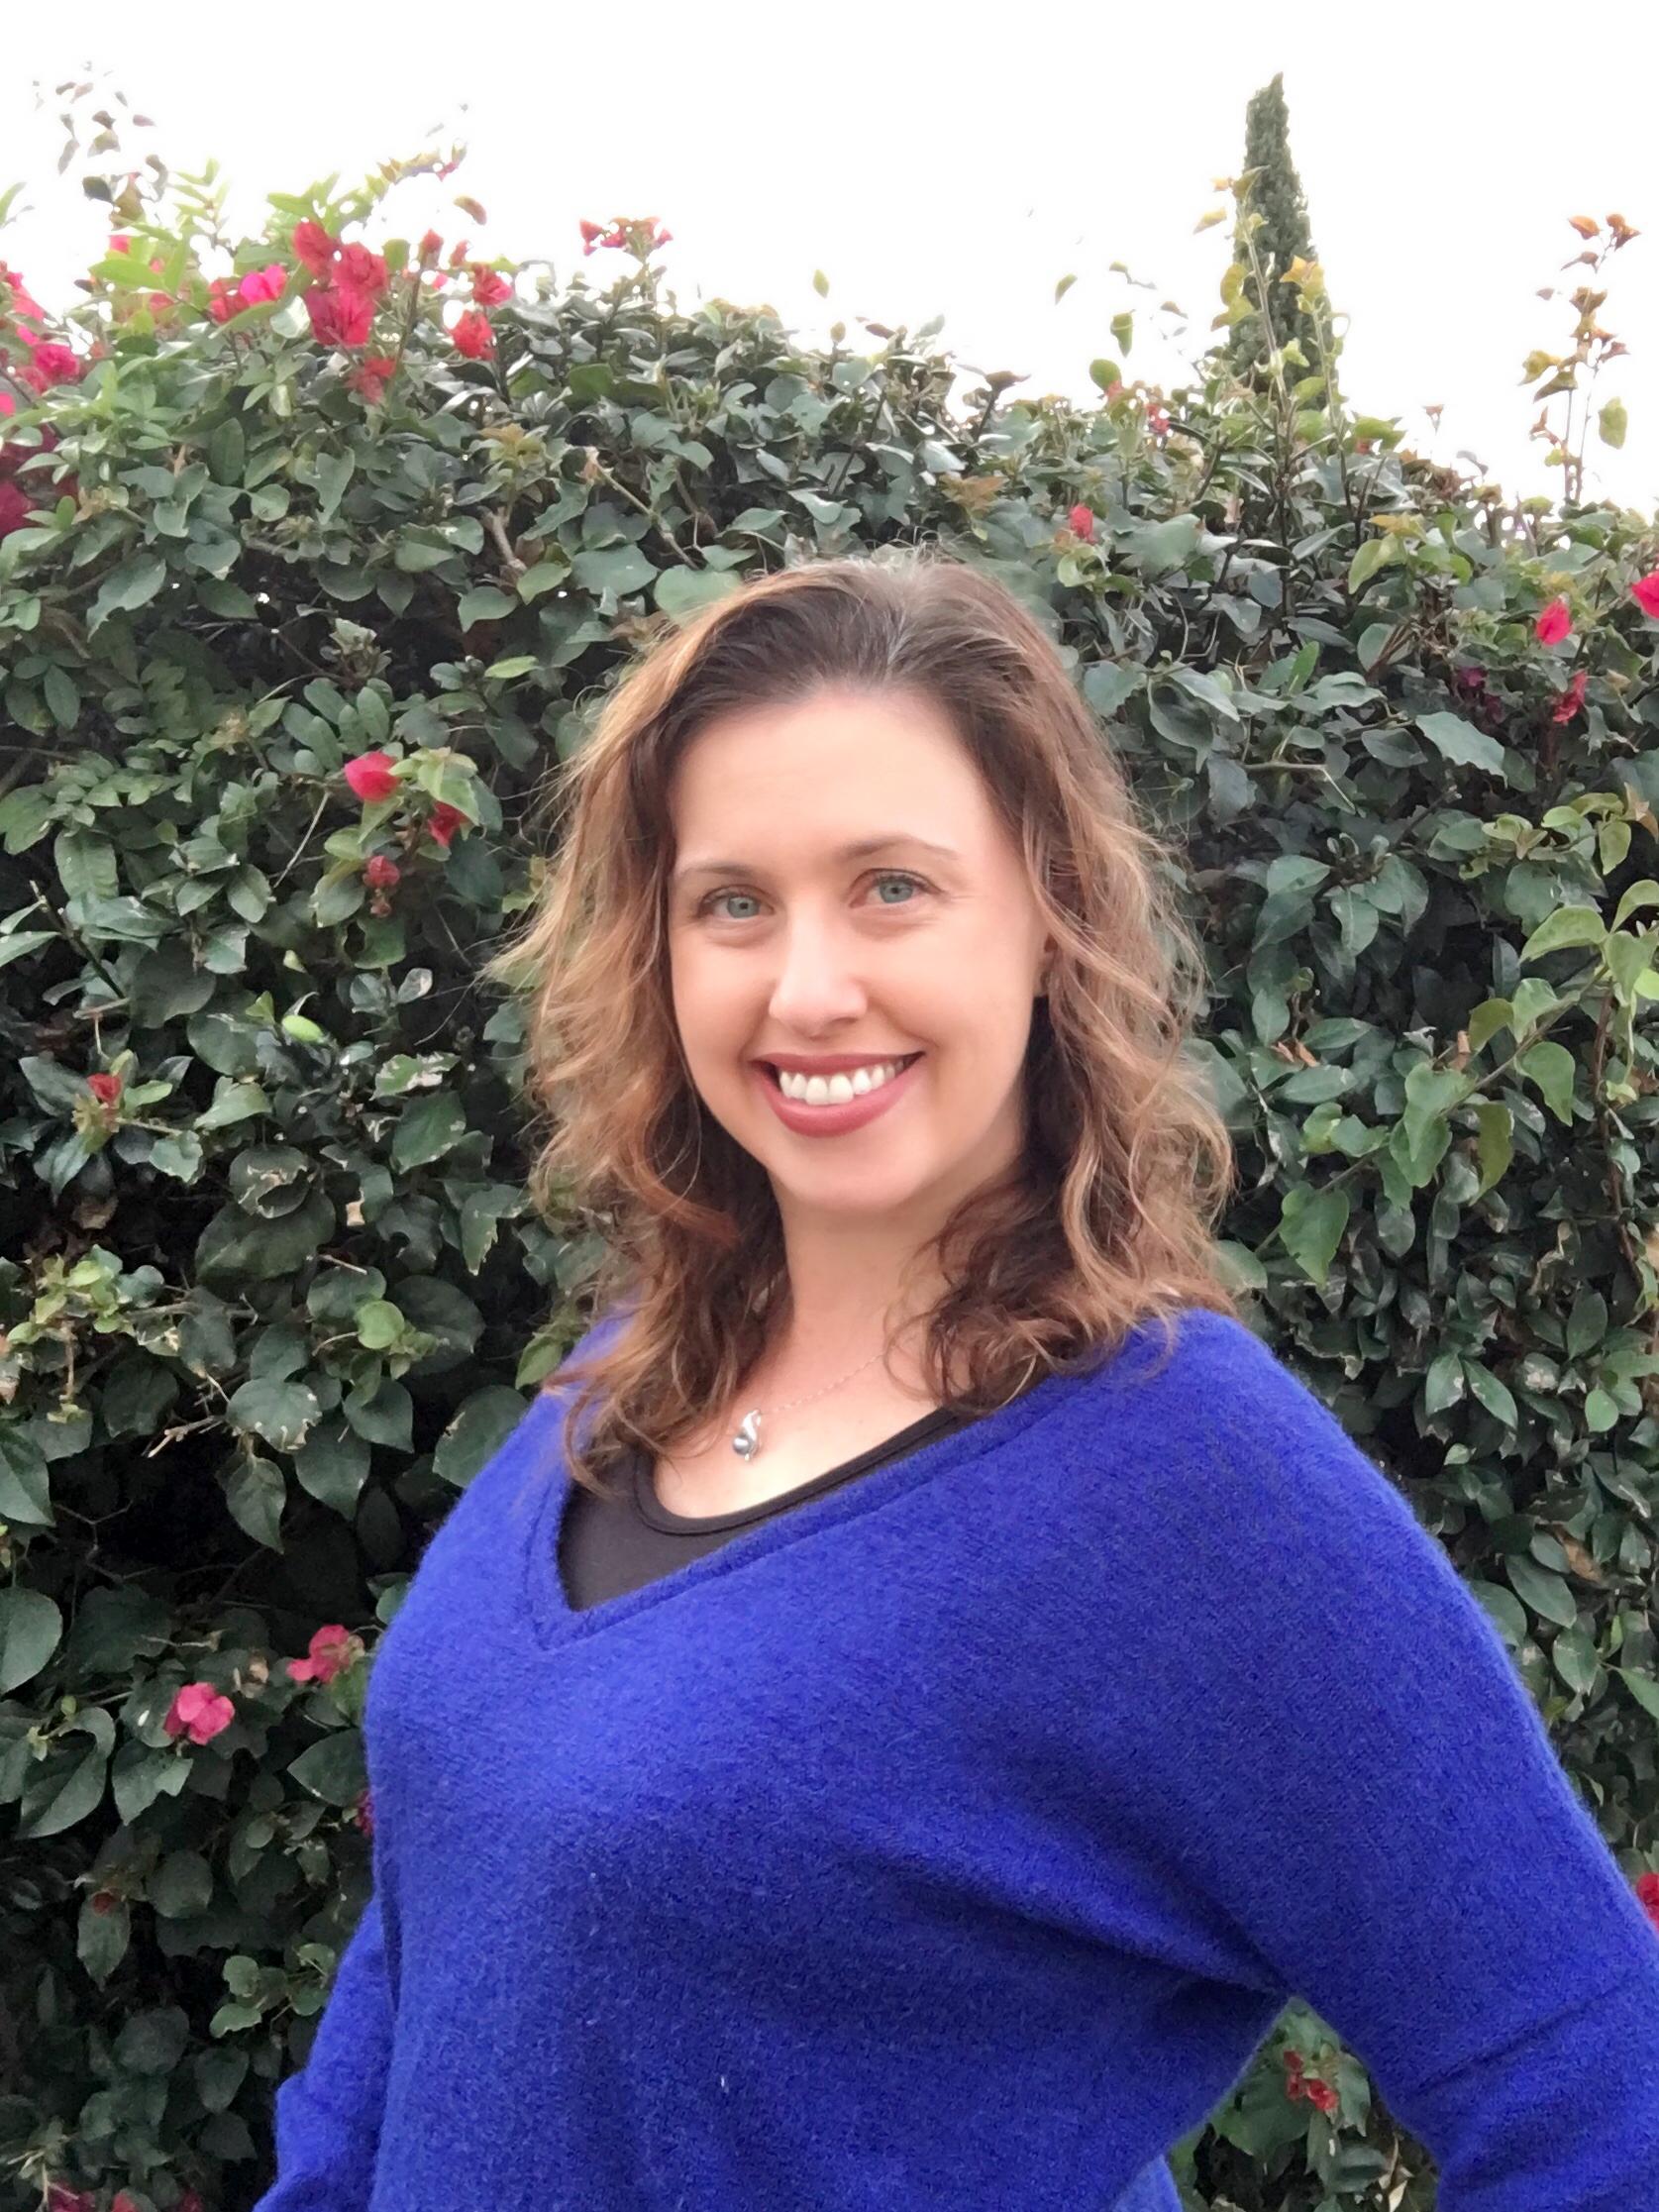 San Diego Therapist - Erica Thompson, LMFT, LPCC